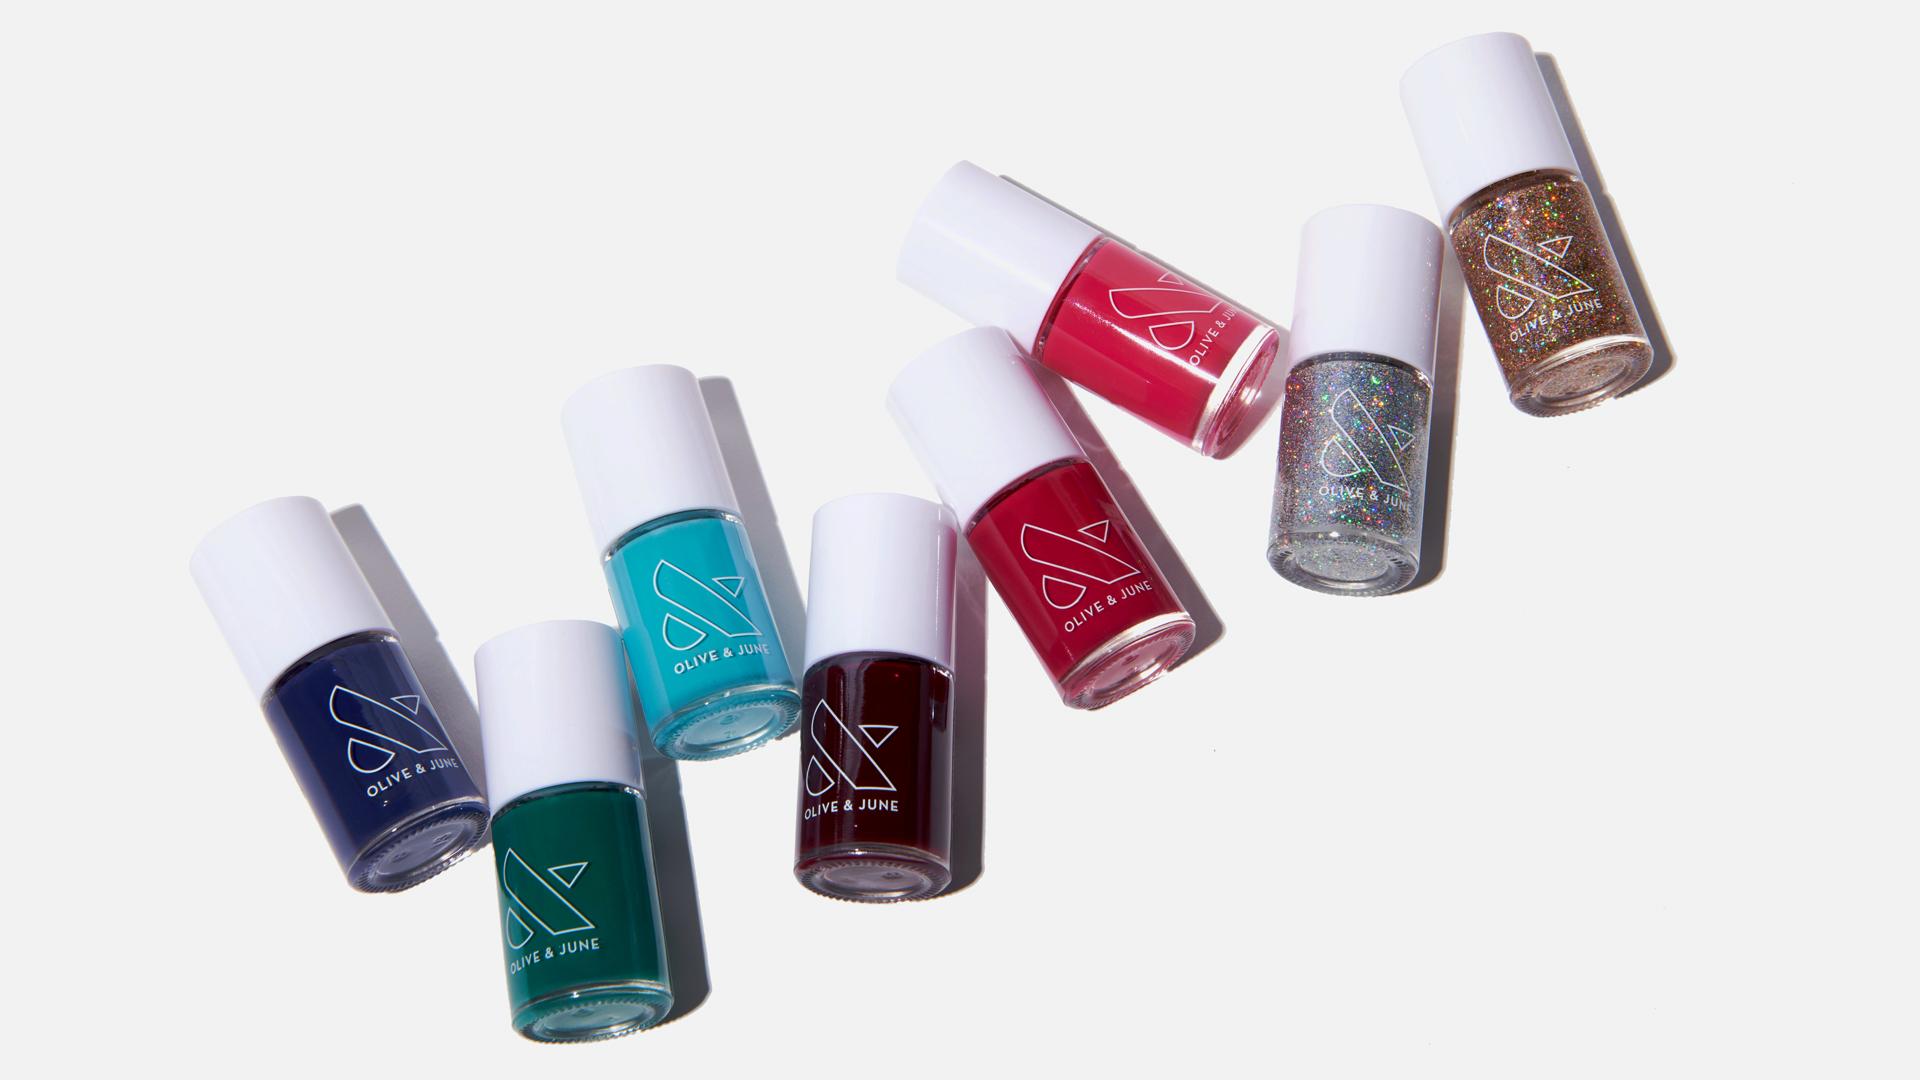 Olive and June manicure sets